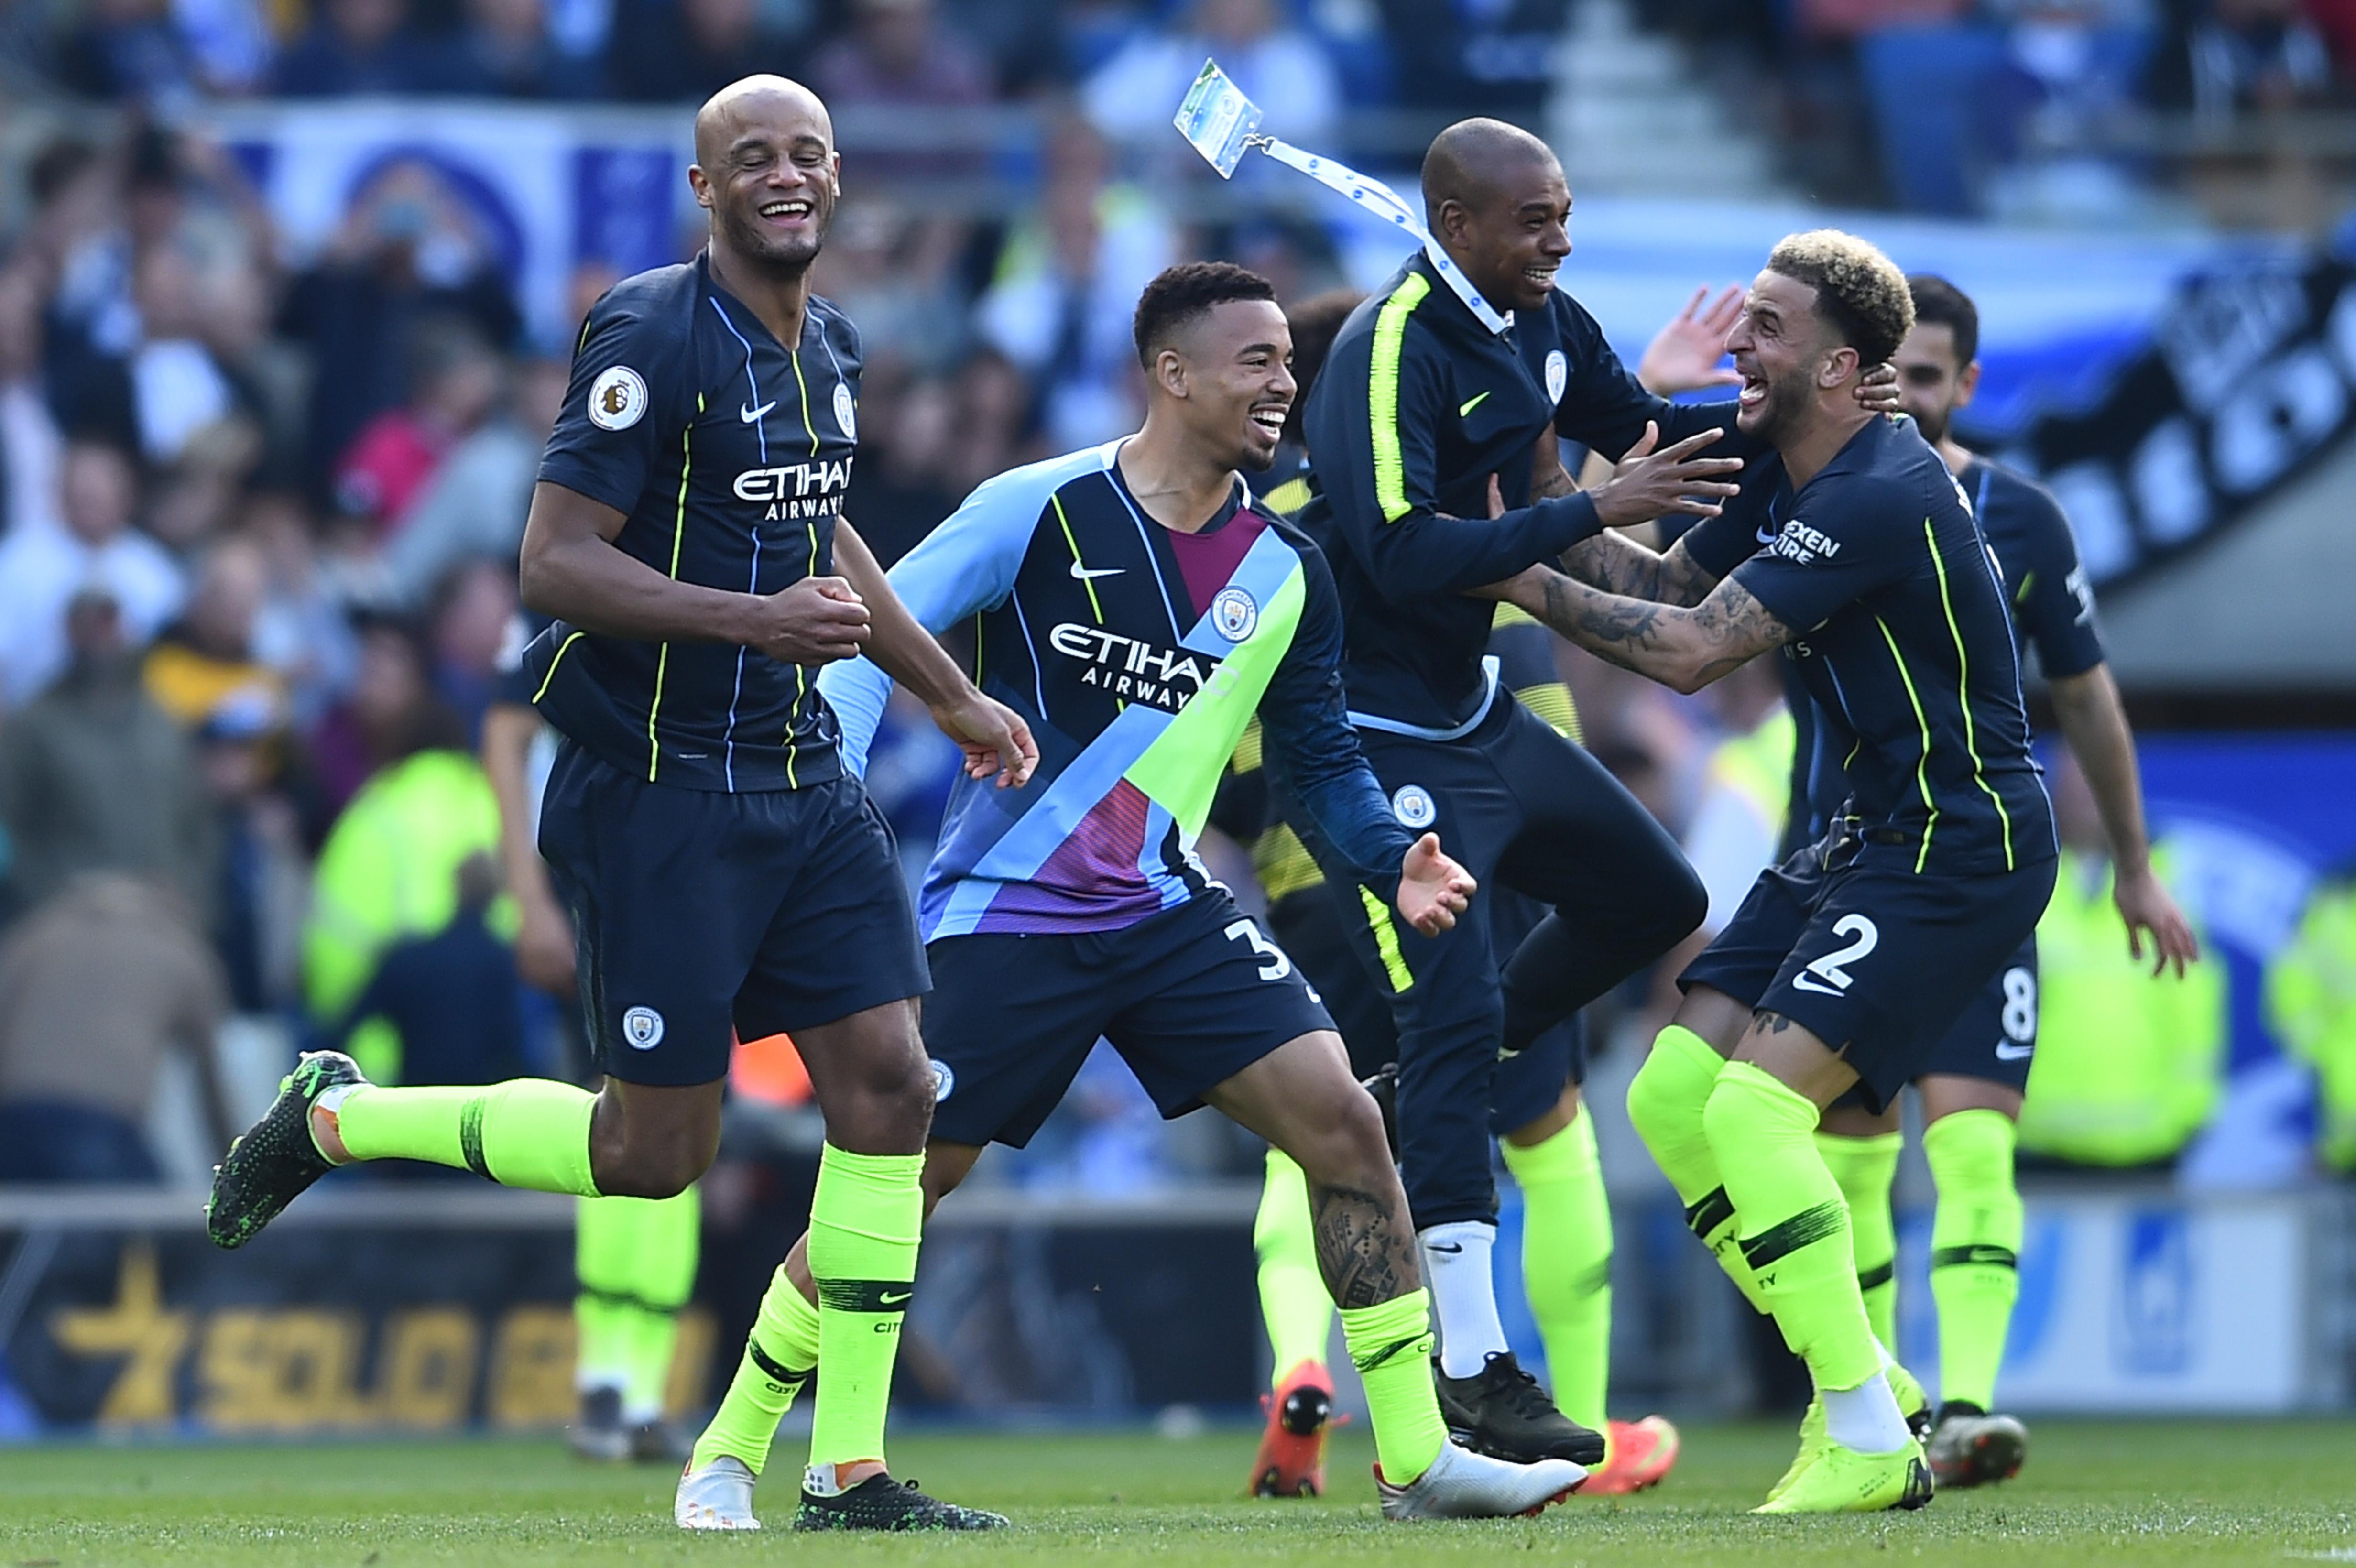 Hatodszor lett angol bajnok a Manchester City